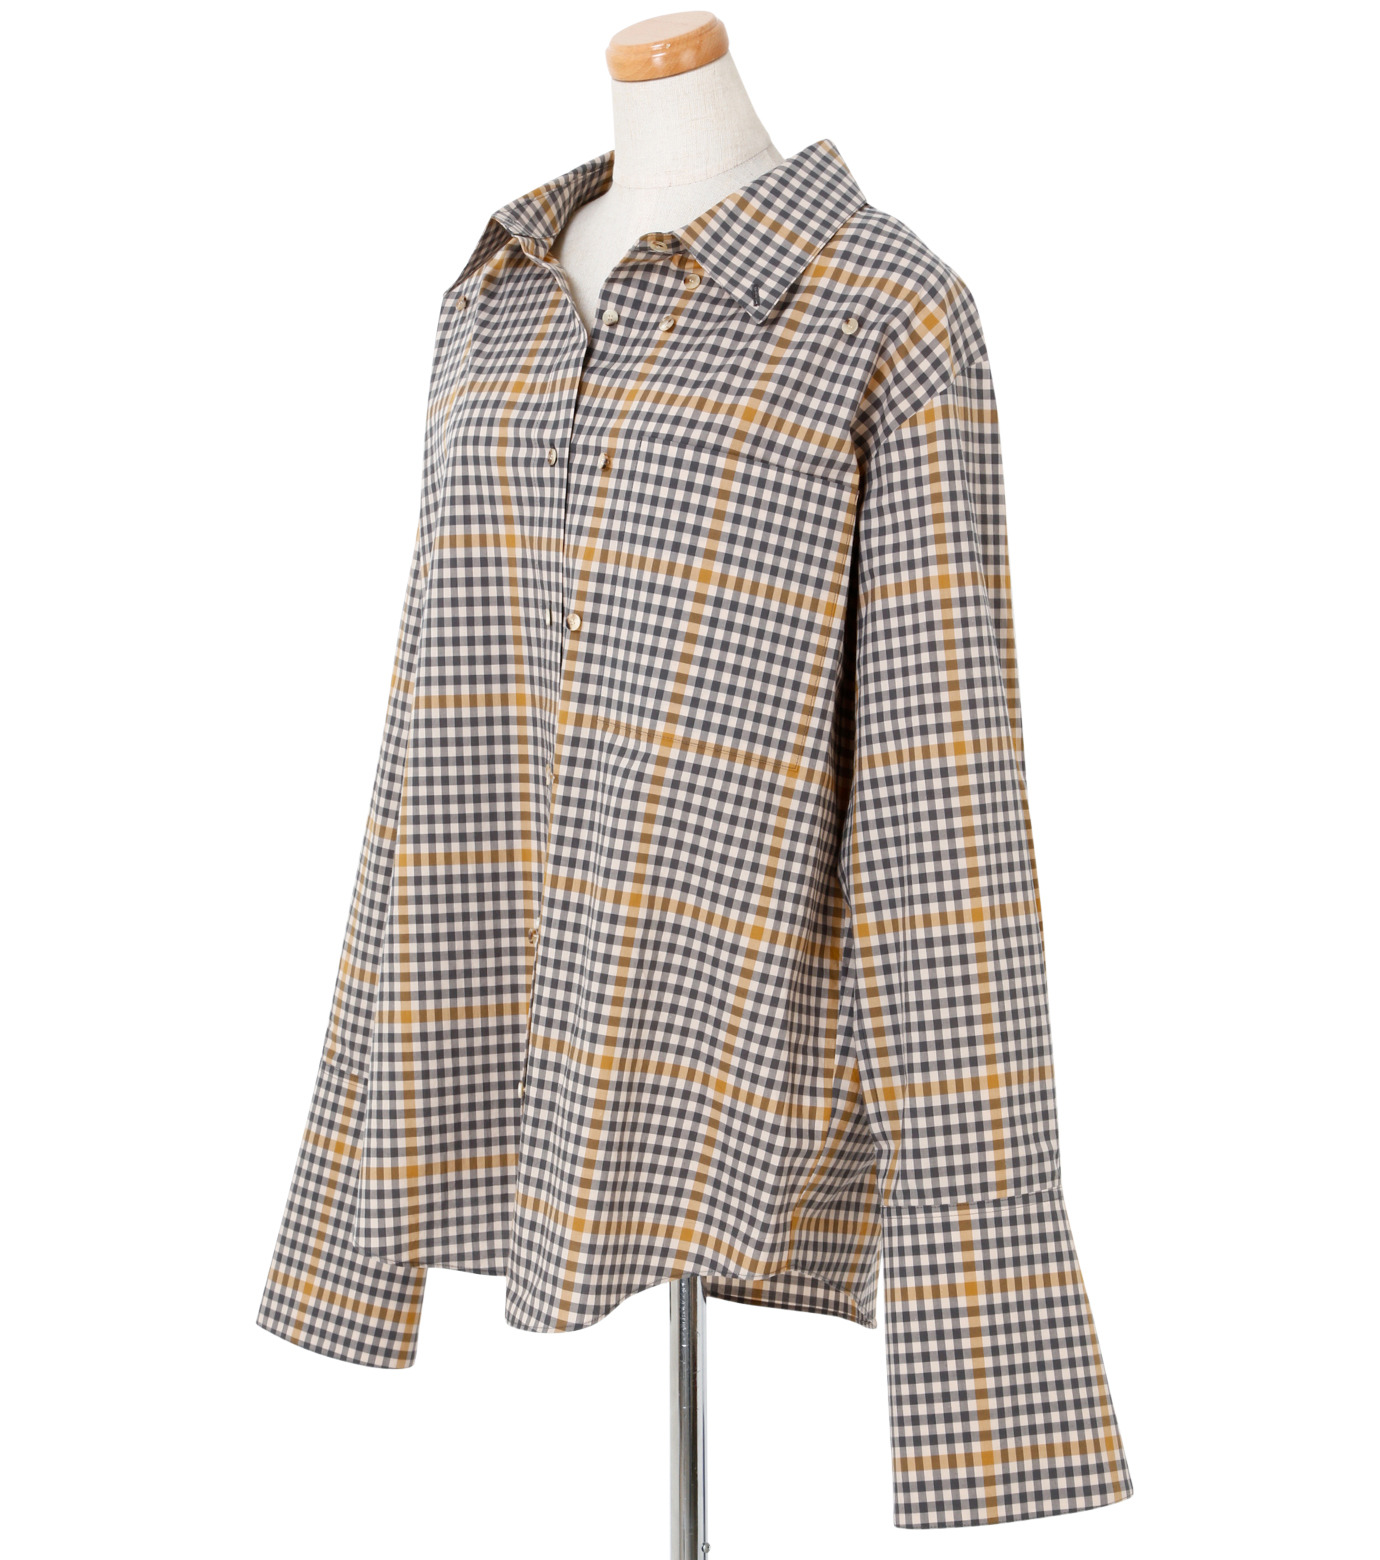 IRENE(アイレネ)のグラフチェックシャツ-LIGHT BEIGE(シャツ/shirt)-19S83001 拡大詳細画像2